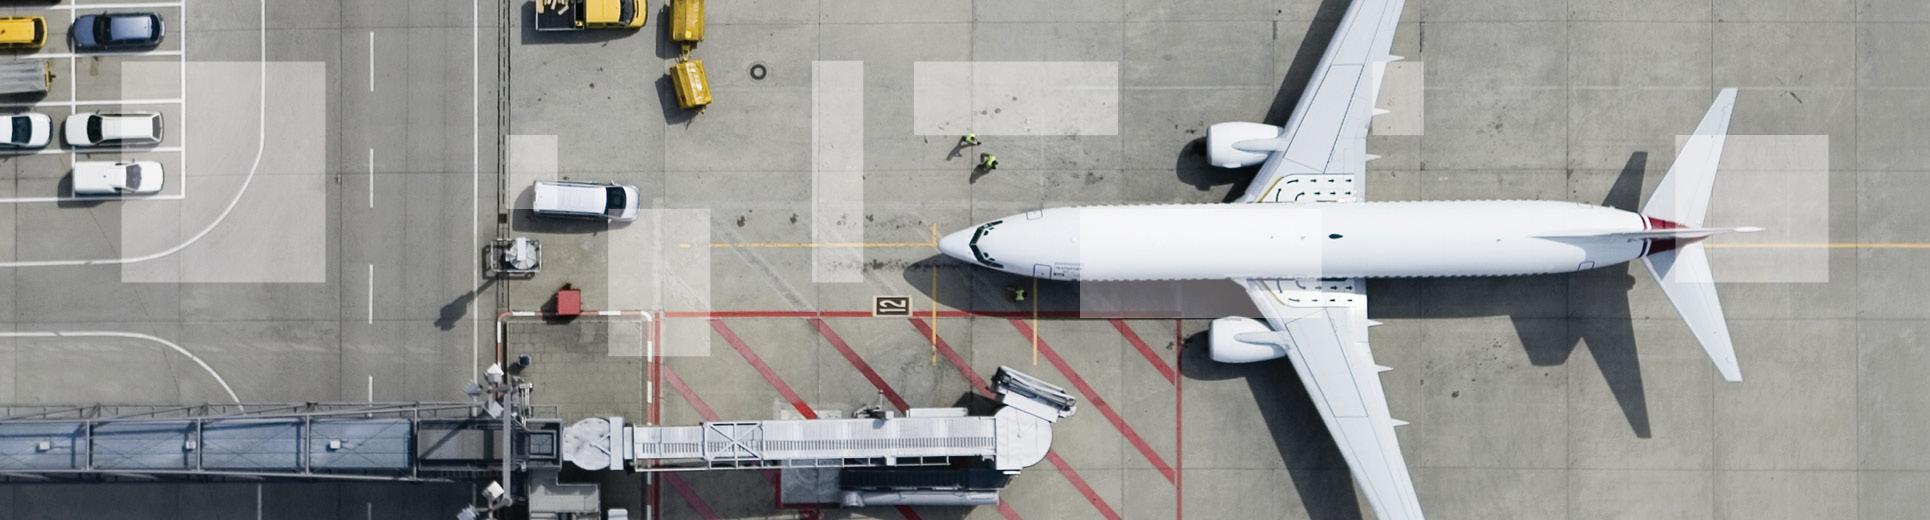 International Aviation Insurance Course 2019